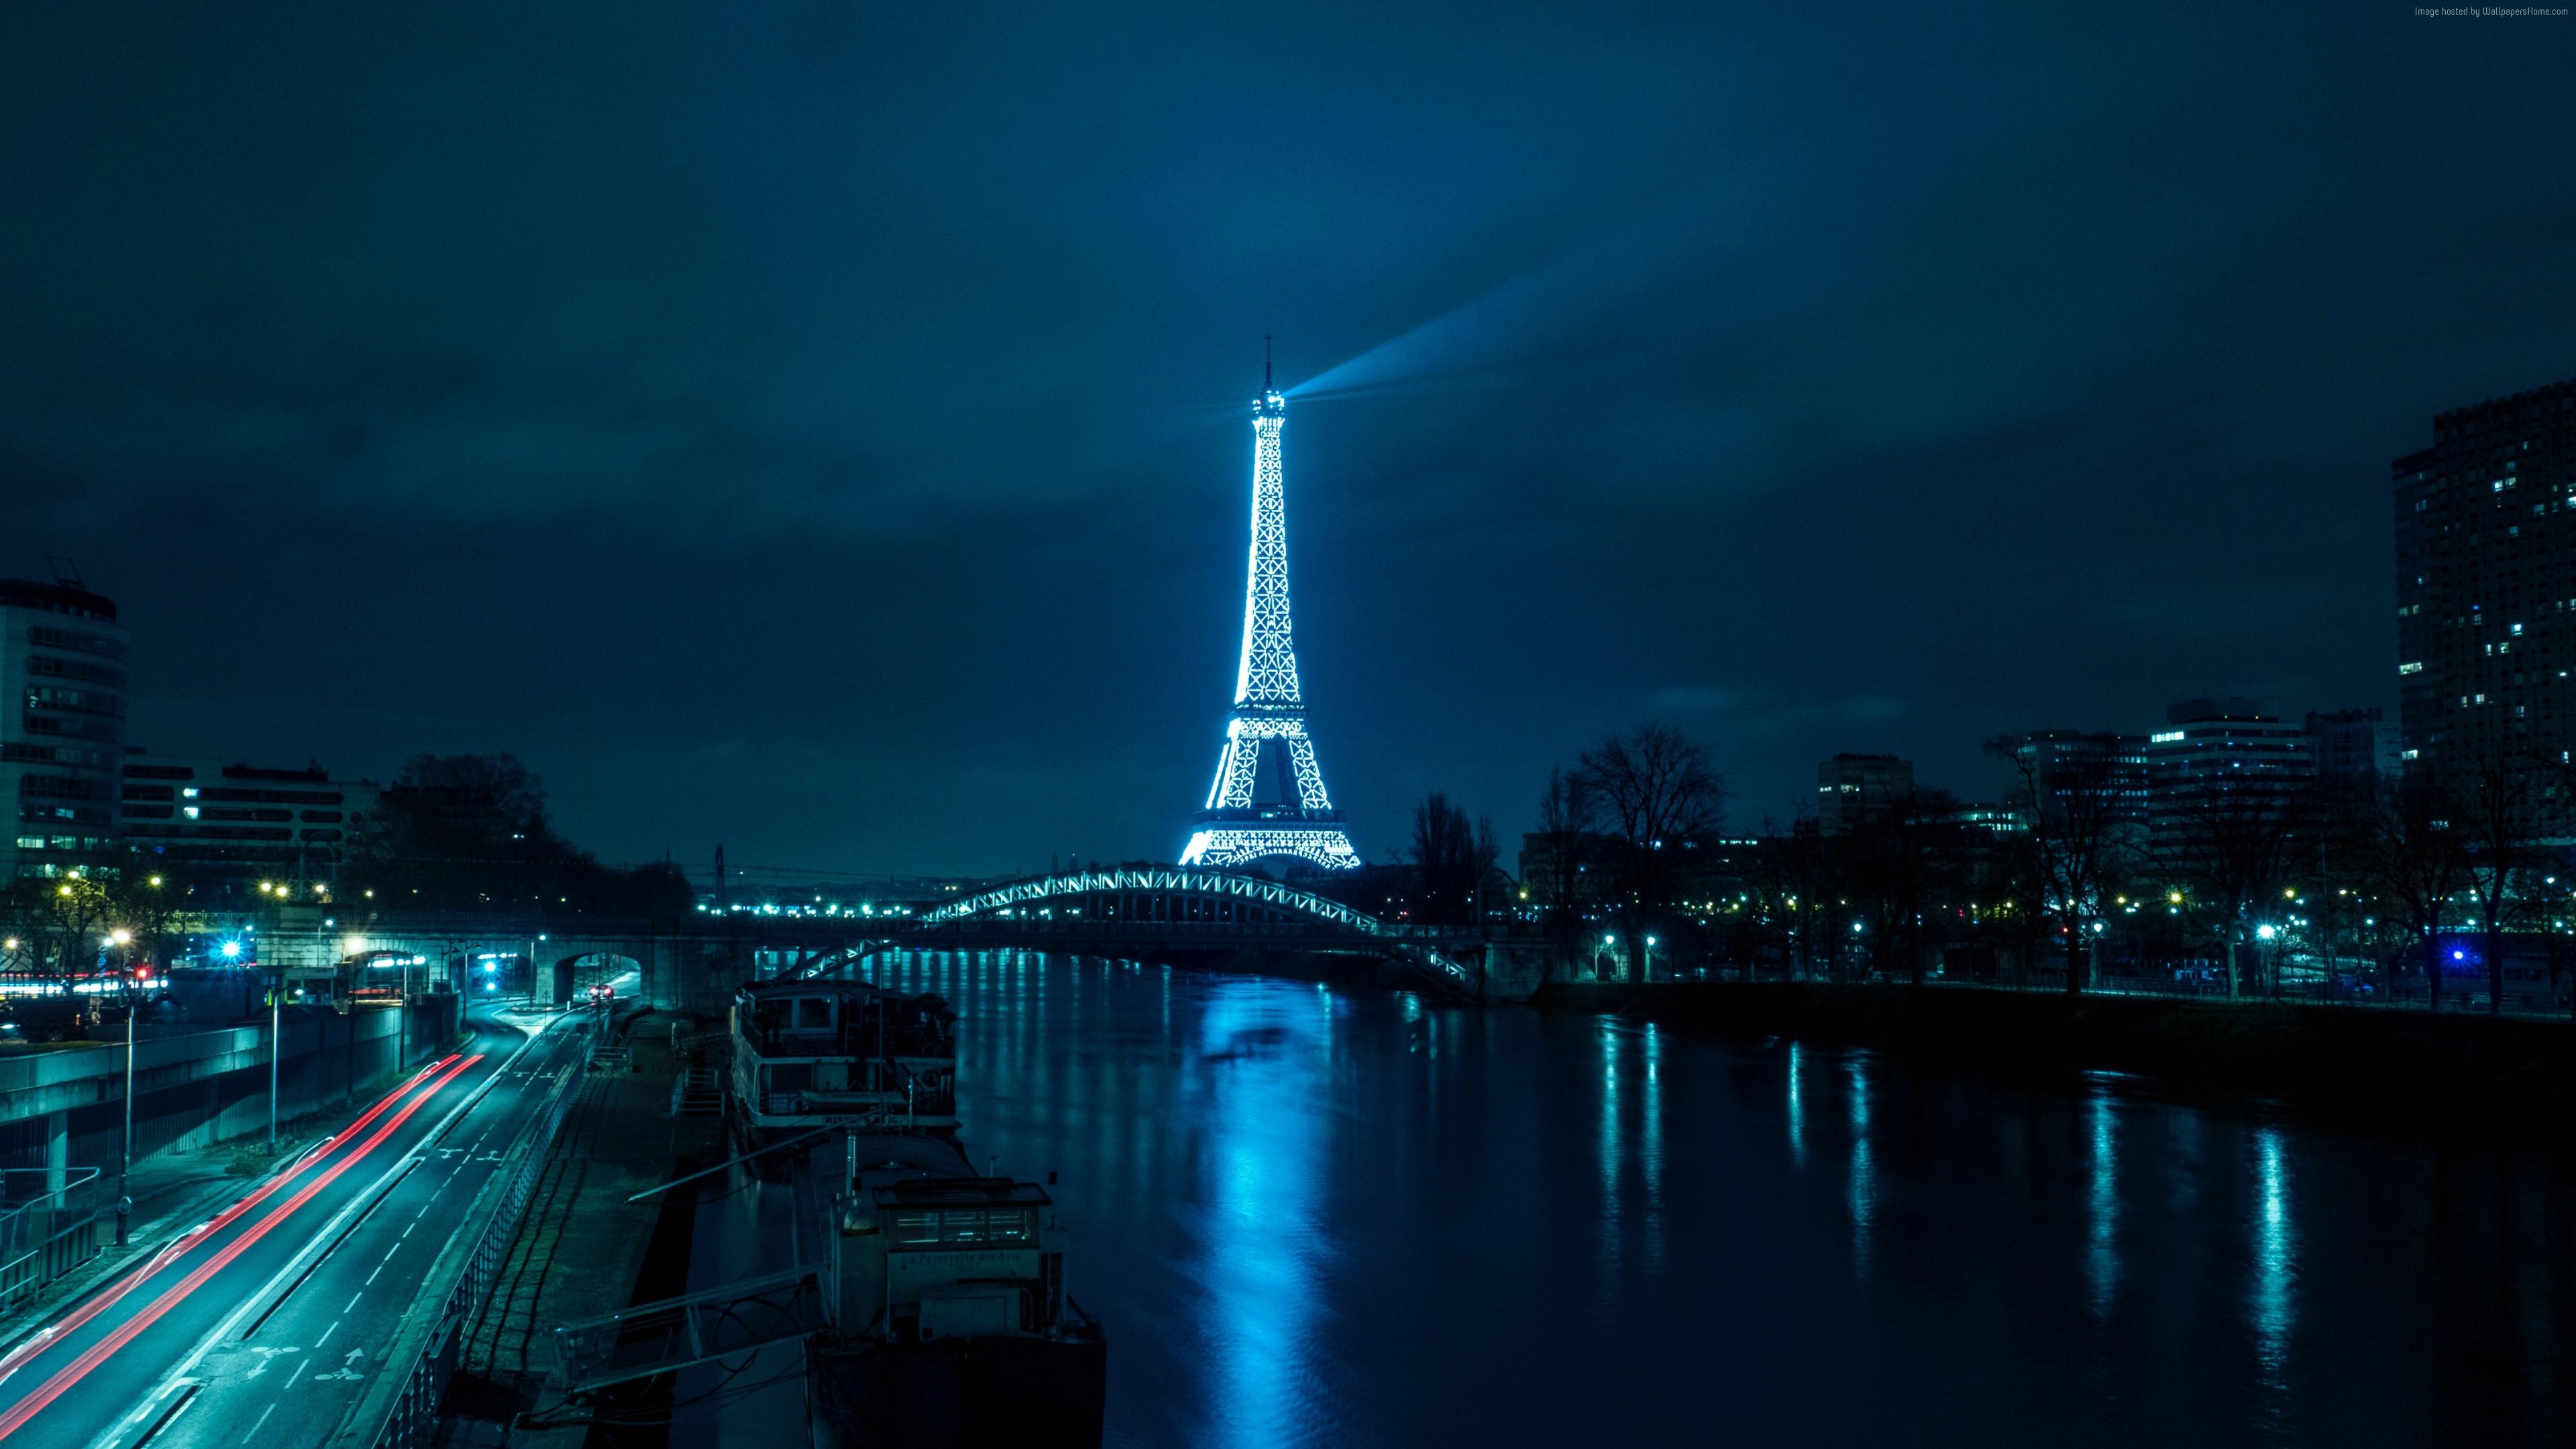 Wallpaper Eiffel Tower France Paris 4k 5k Architecture Wallpaper Download High Resolution 4k Wallpaper